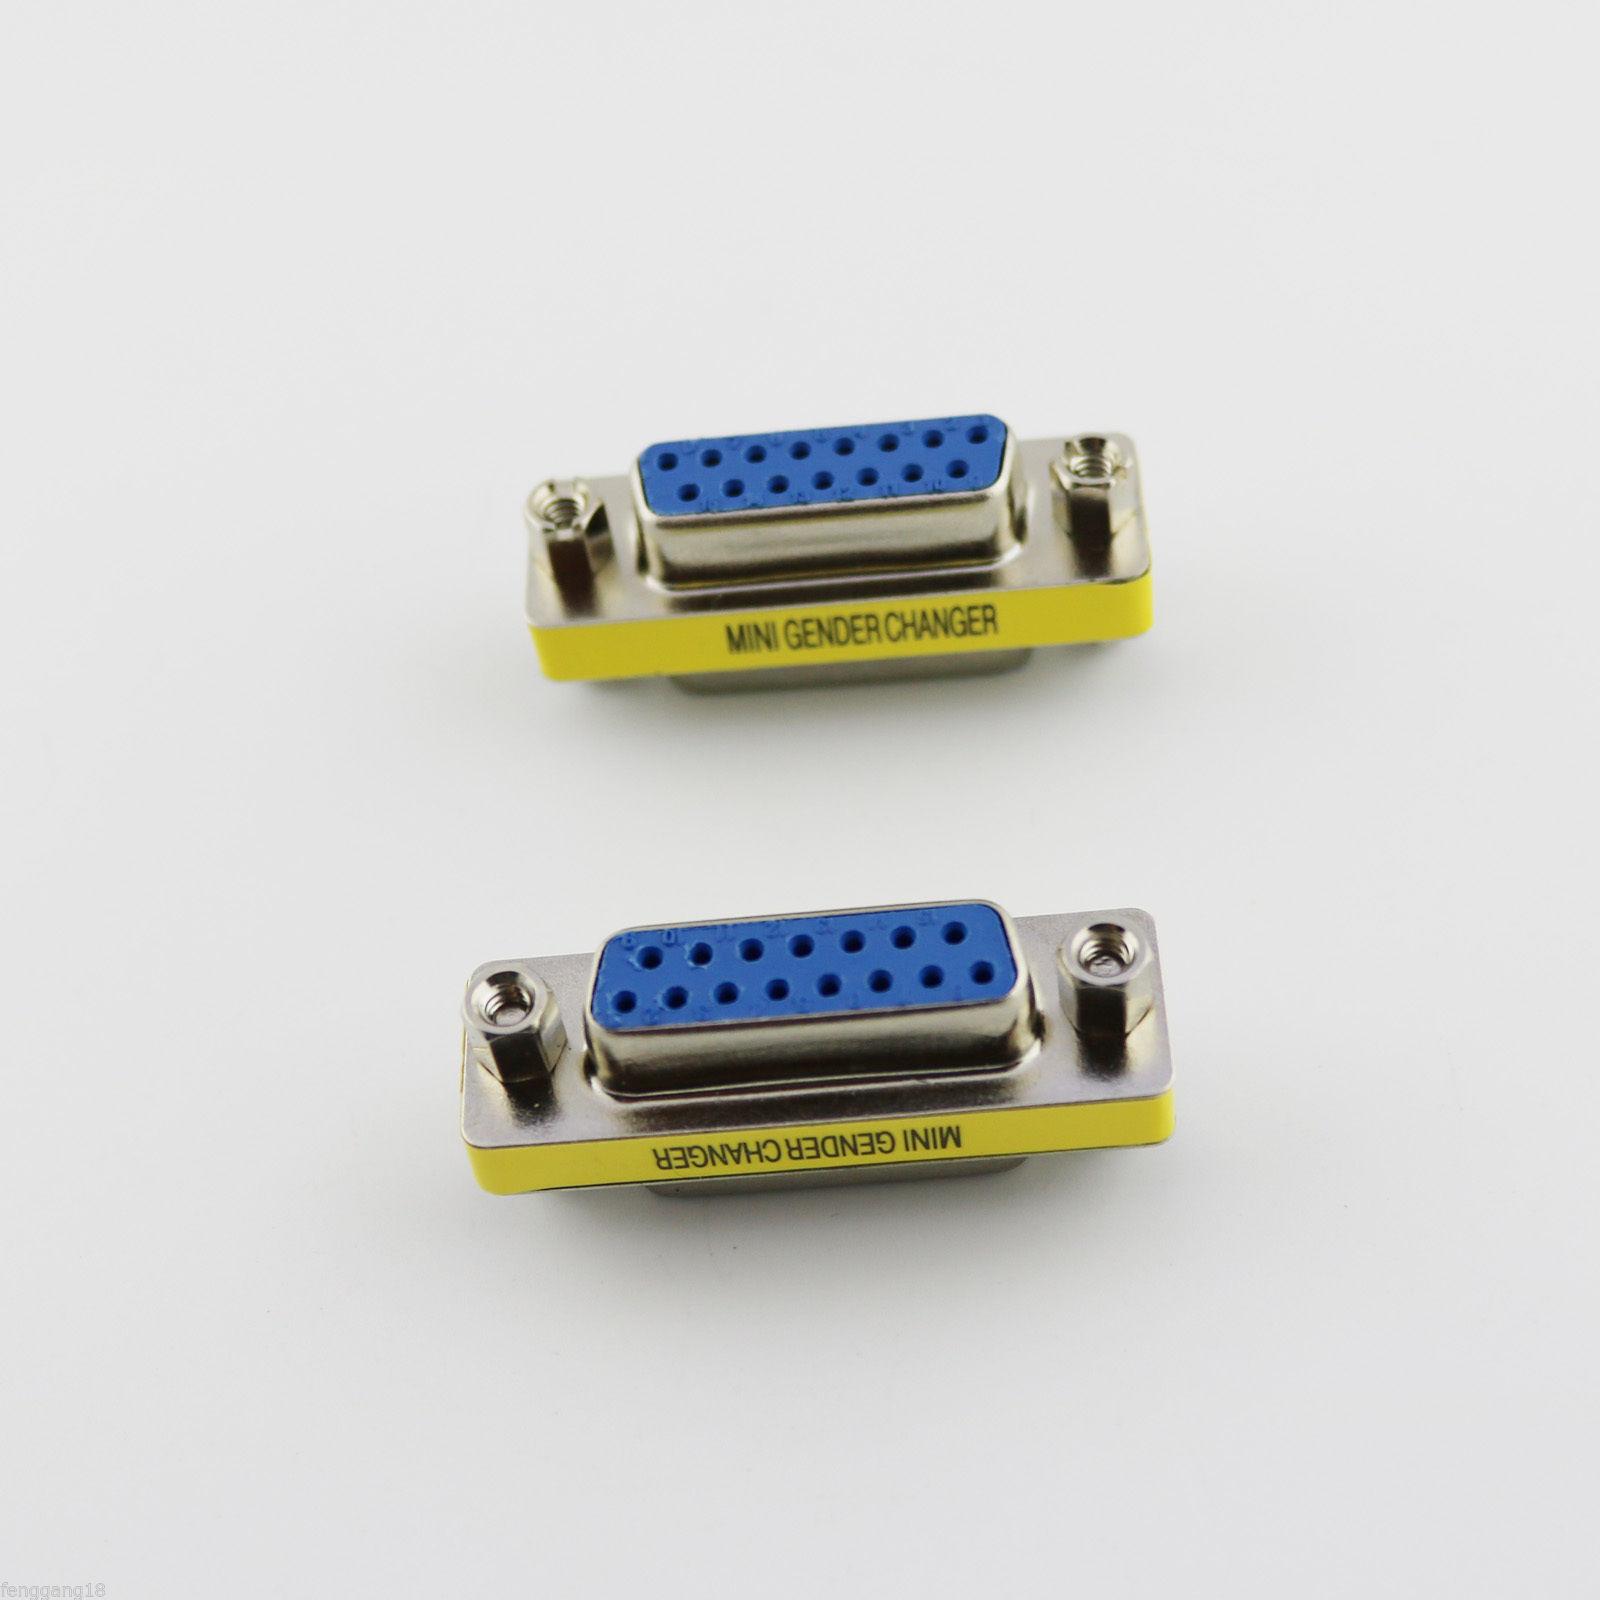 D-SUB VGA//SVGA 15 Pin DB15 Female 3 Rows To Female Mini Gender Changer Adapter